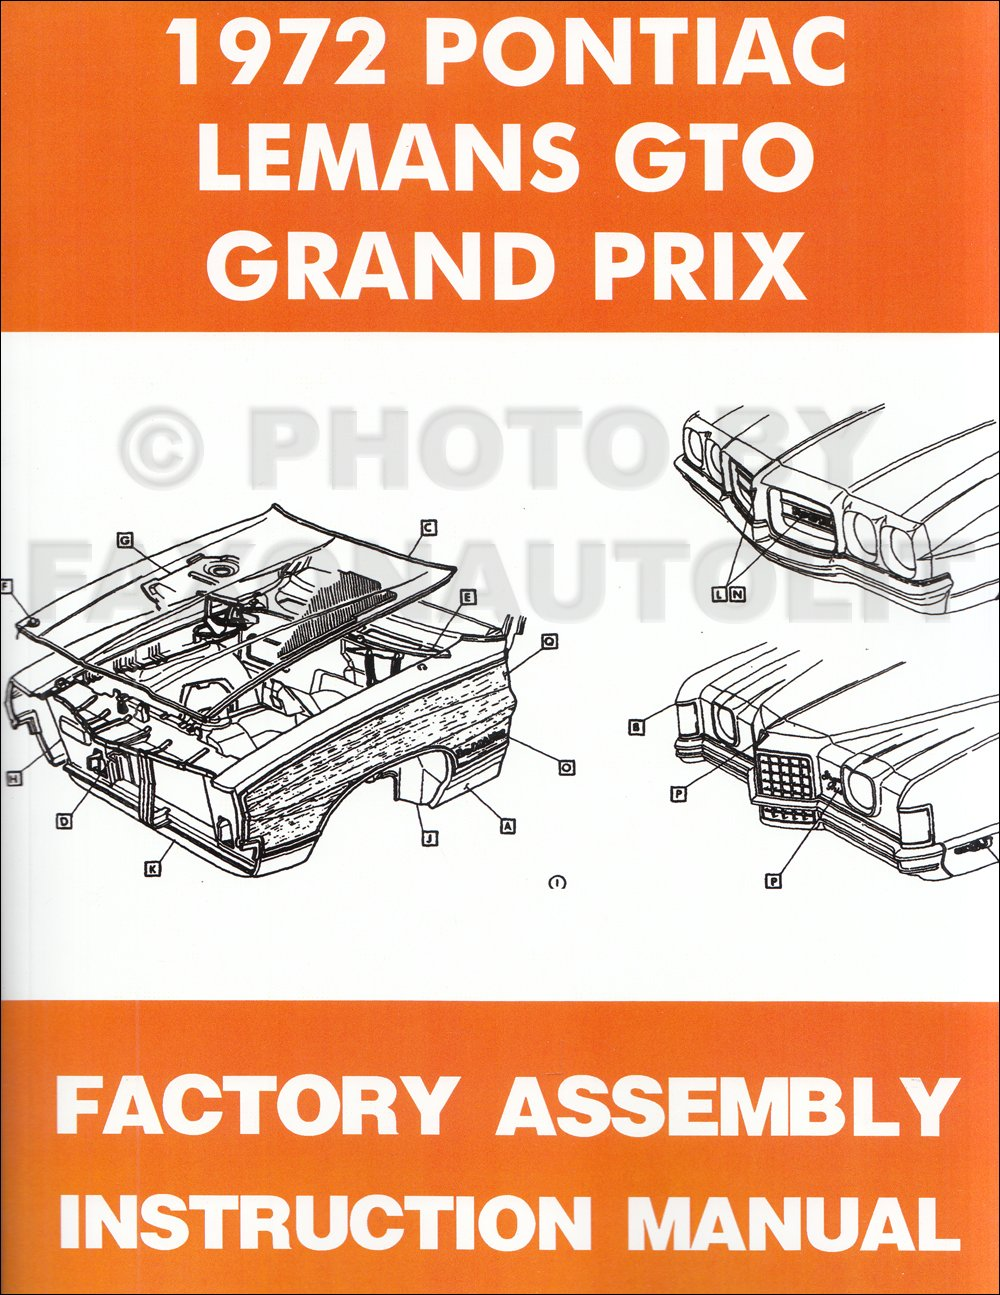 1972 Pontiac Lemans Gto And Grand Prix Assembly Manual Reprint Wiring Diagram Books